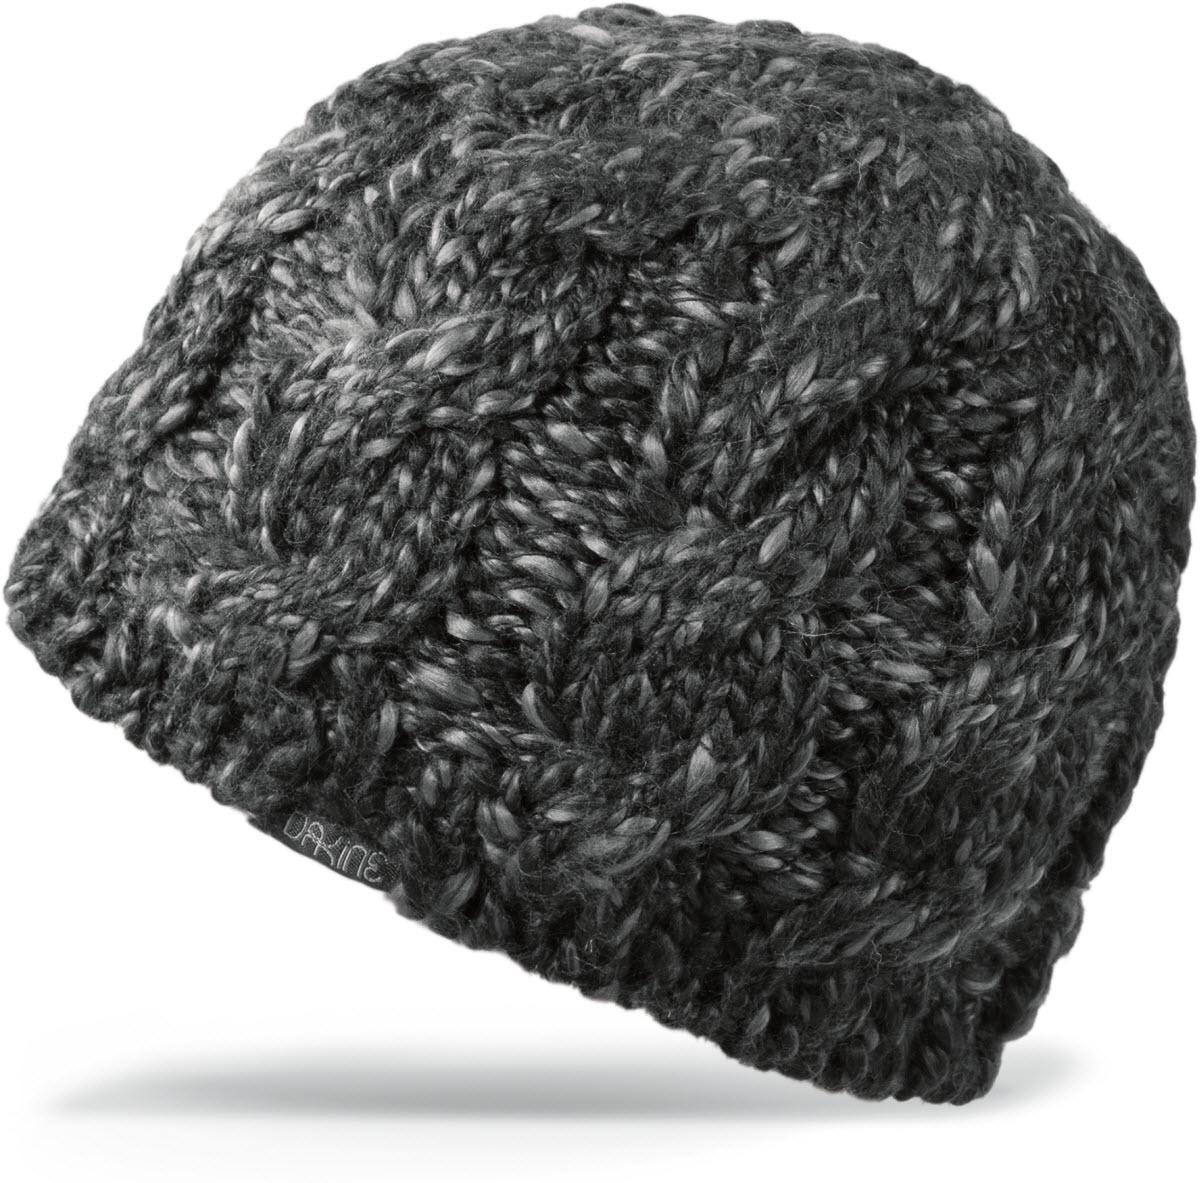 Product image of Dakine Vine Womens Beanie Hat Black Mix